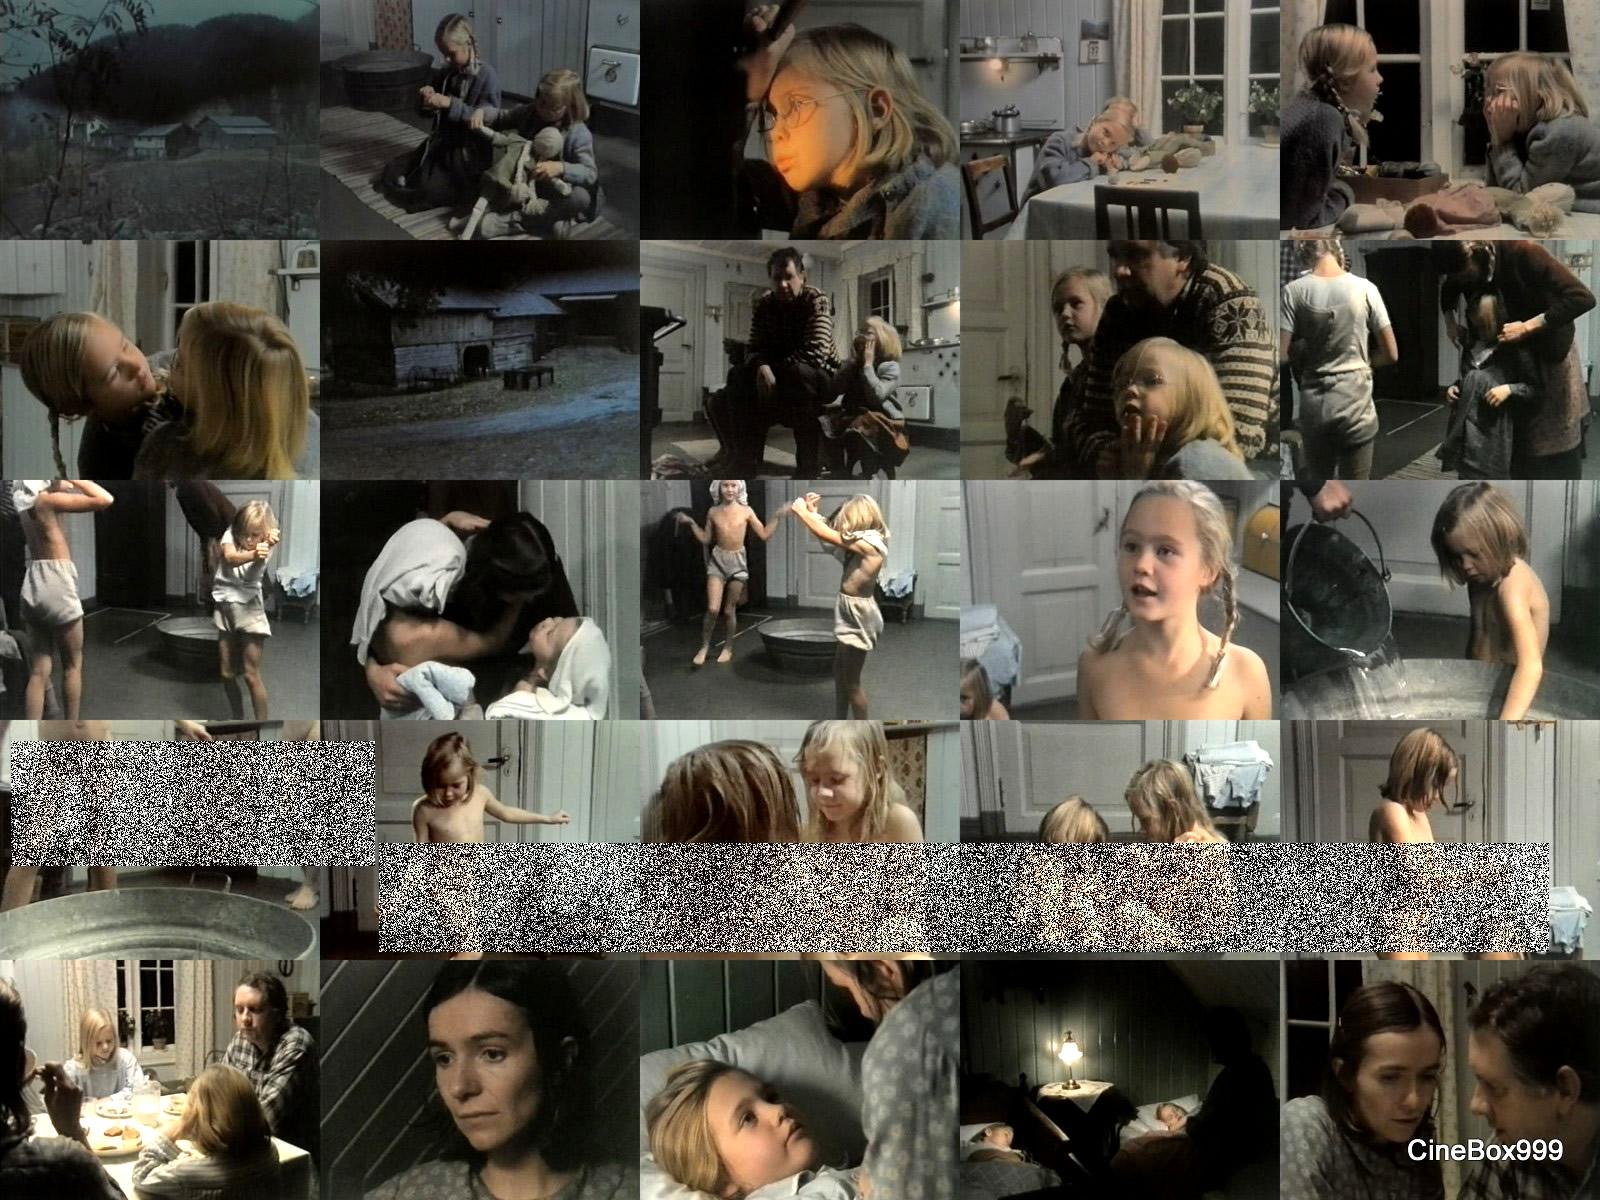 Carmen 1998 full vintage movie - 1 6